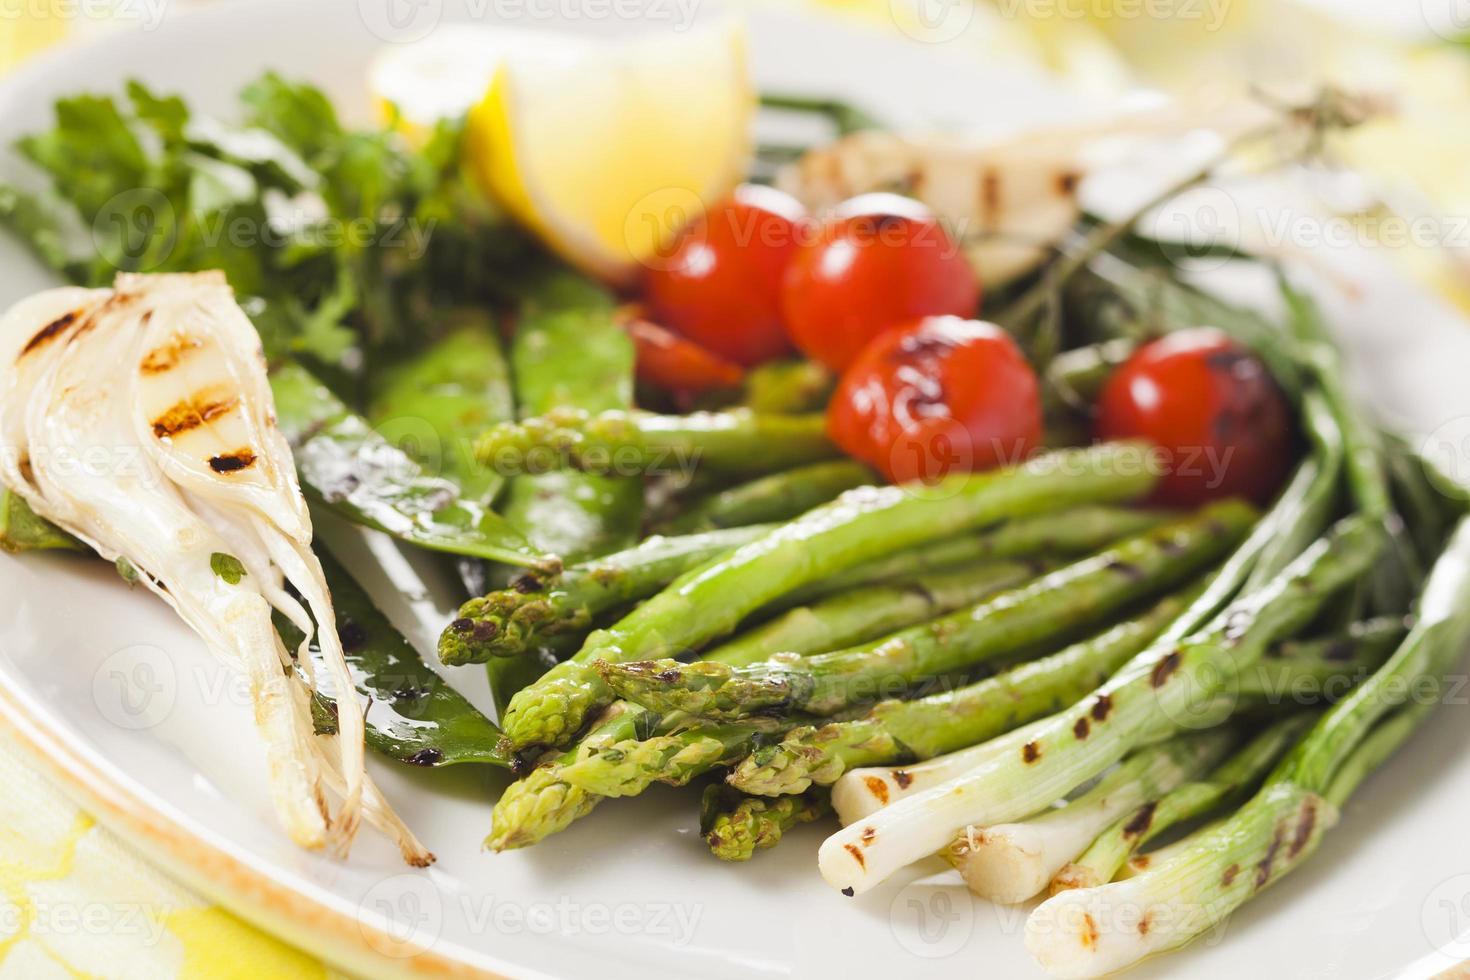 legumes grelhados marinados - aspargos, cebolas, ervilhas, tomates foto